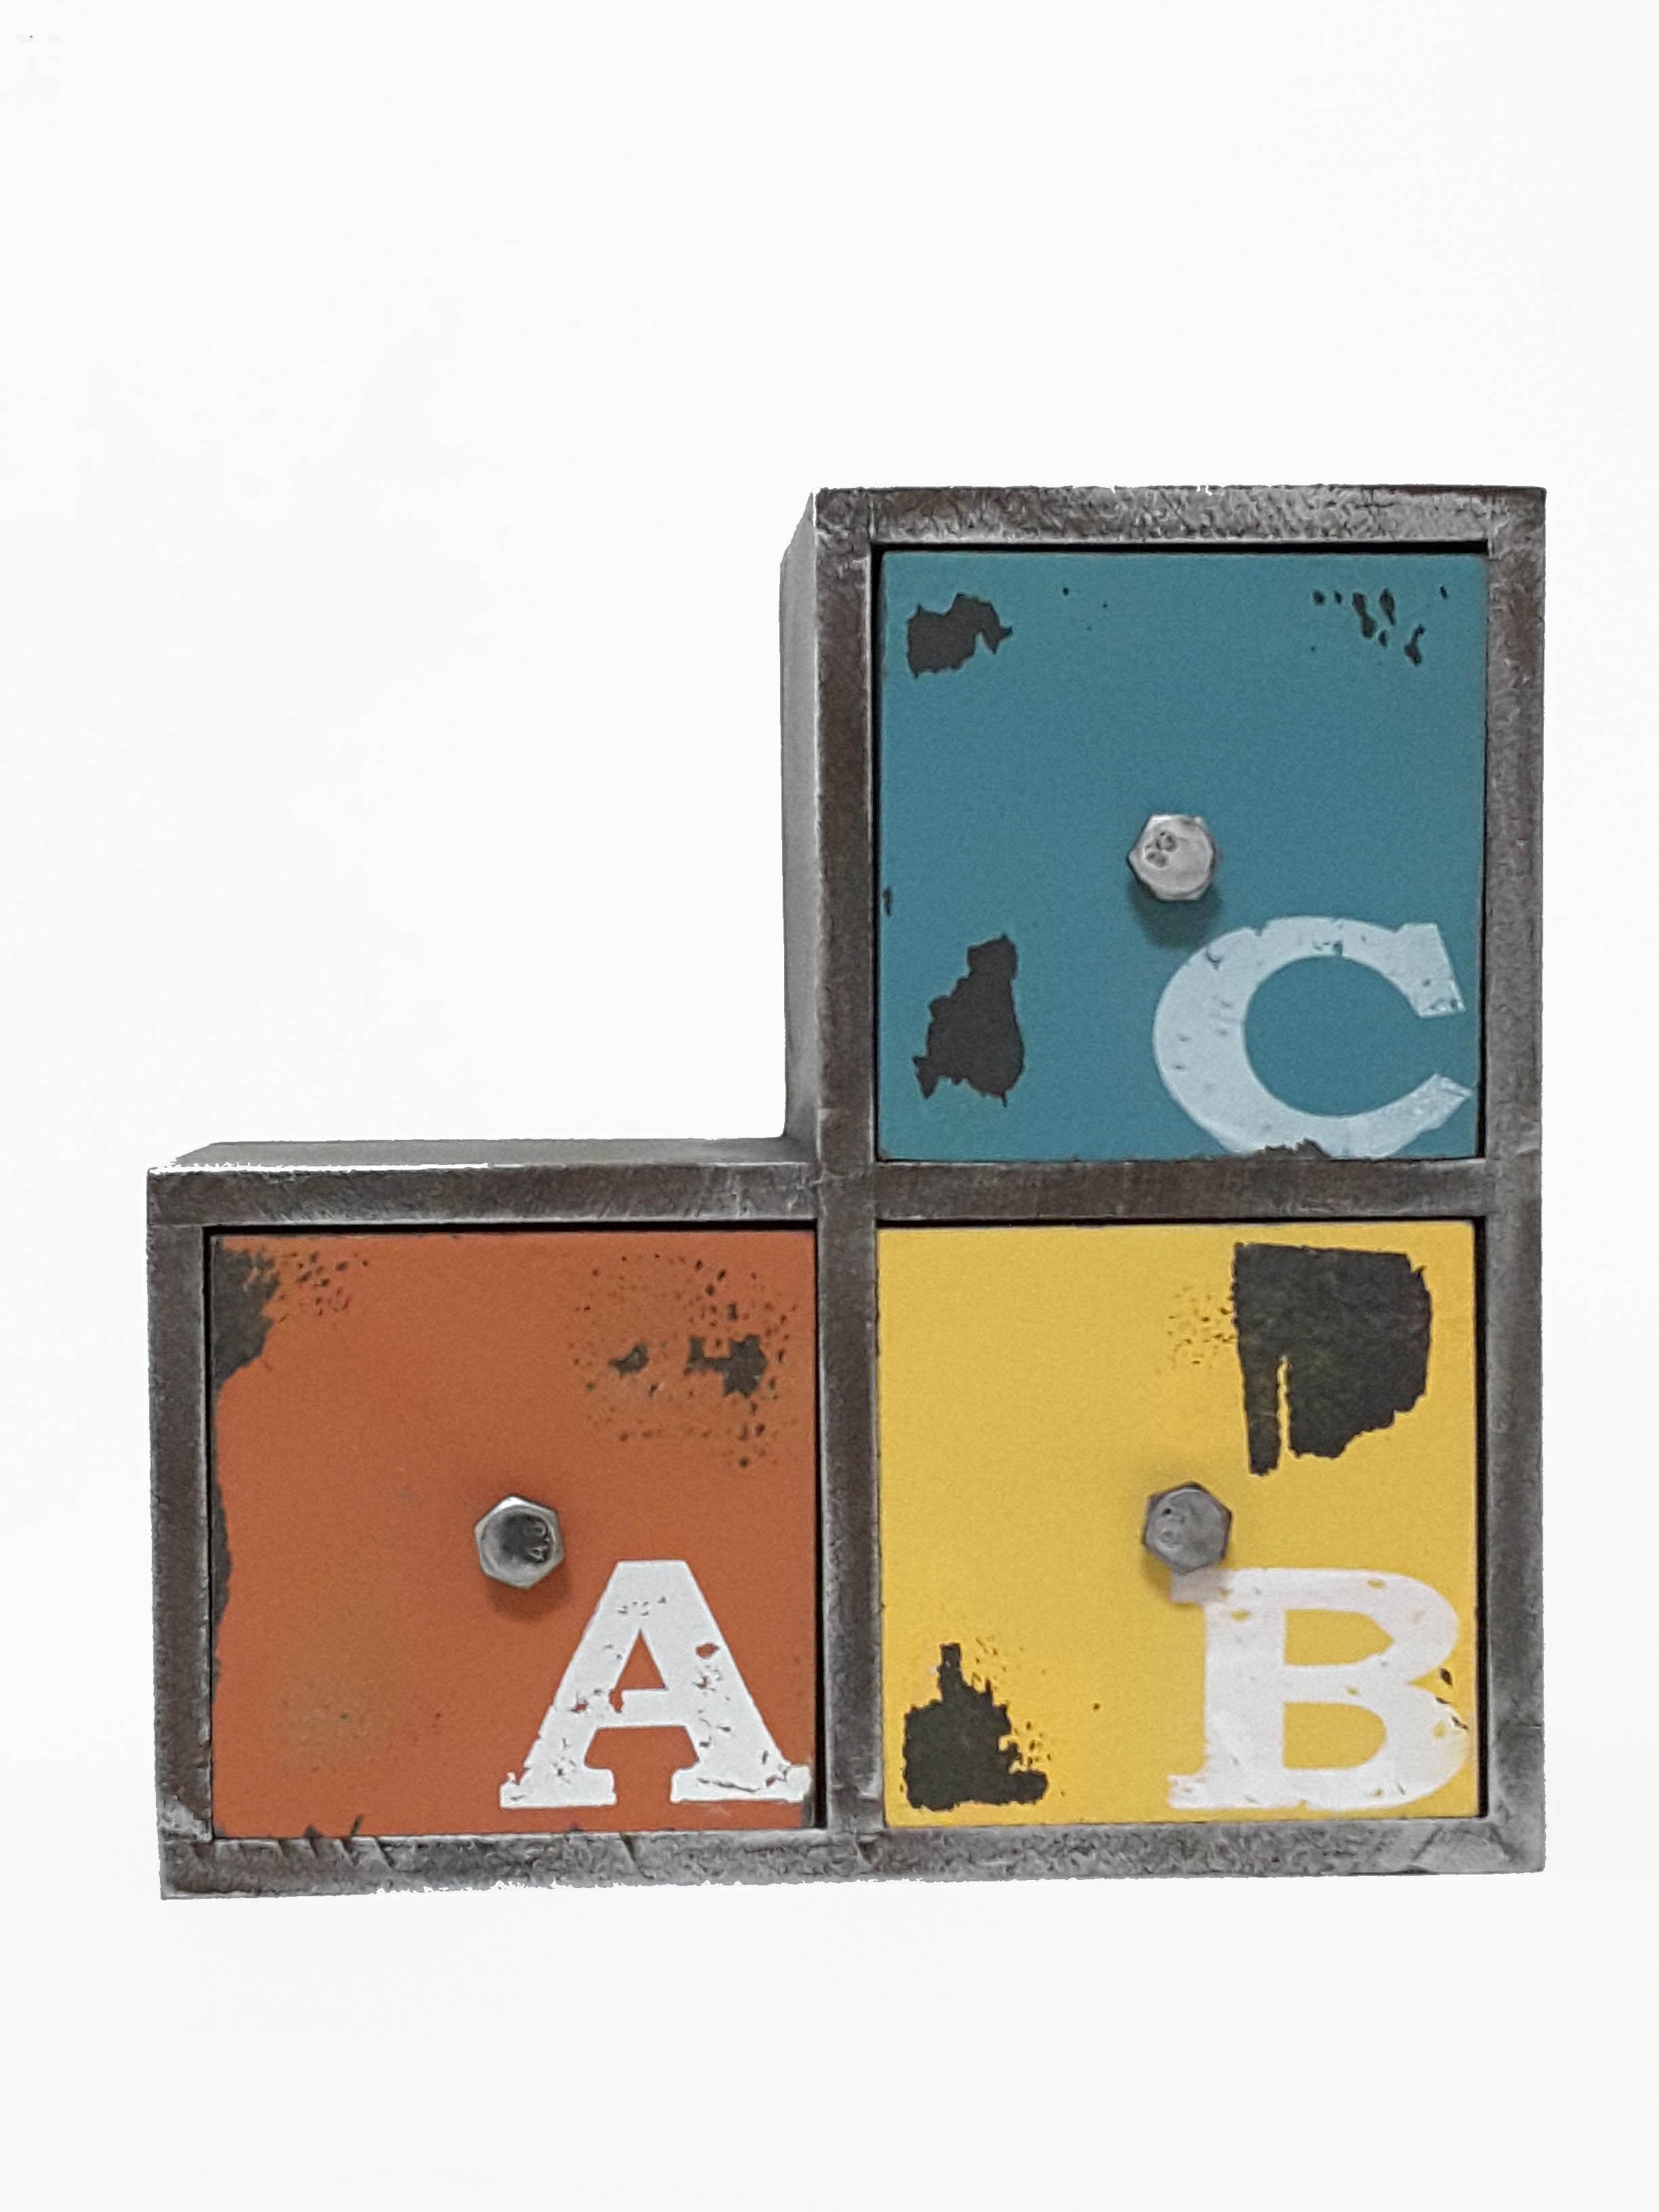 La maison生活小舖《工藝風鐵製三格抽屜櫃》ABC彩色圖案 收納物品 裝飾環境 實用美觀 收納櫃/抽屜櫃/置物櫃/復古擺飾/工蓺風